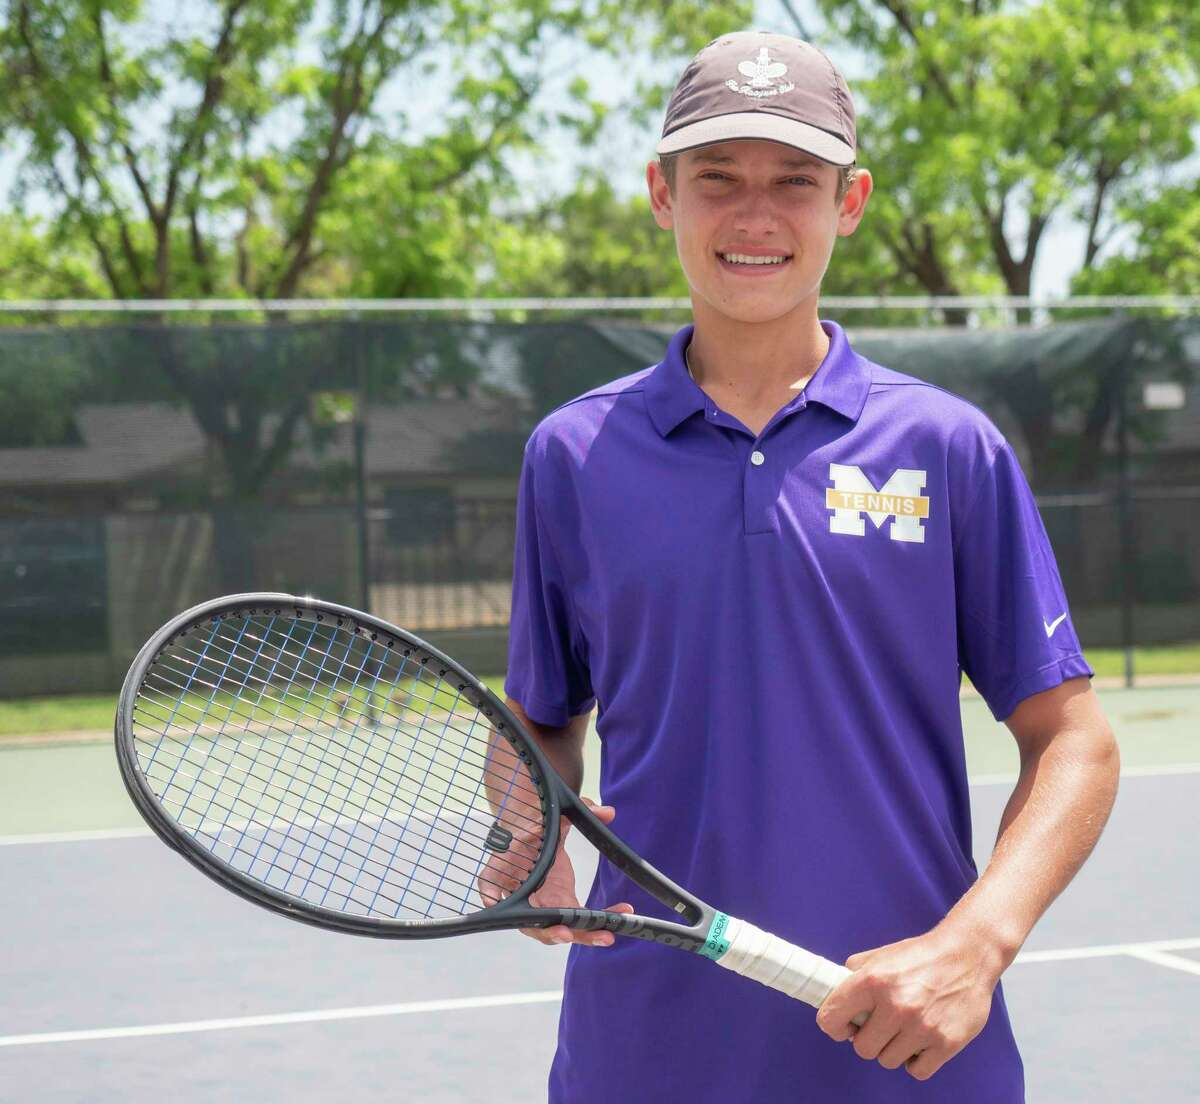 Midland High's Tyler Stewart will compete at the UIL State tournament for singles tennis. 05/12/2021 Tim Fischer/Reporter-Telegram